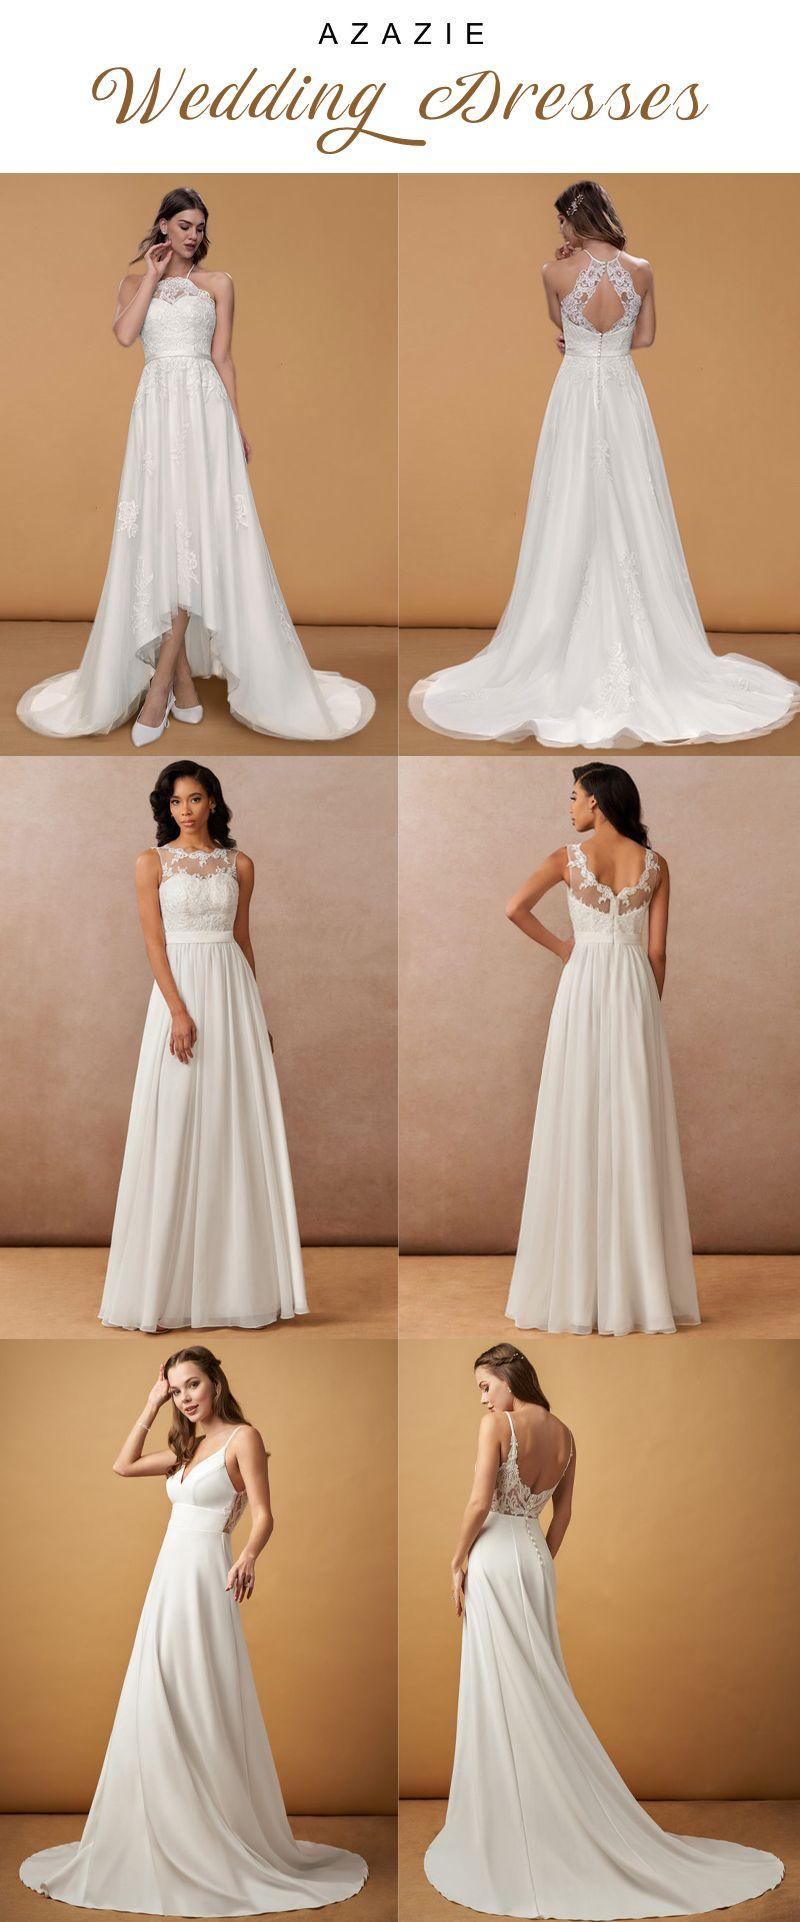 Azazie Wedding Dresses In 2020 Wedding Dresses Dresses Bridal Gowns